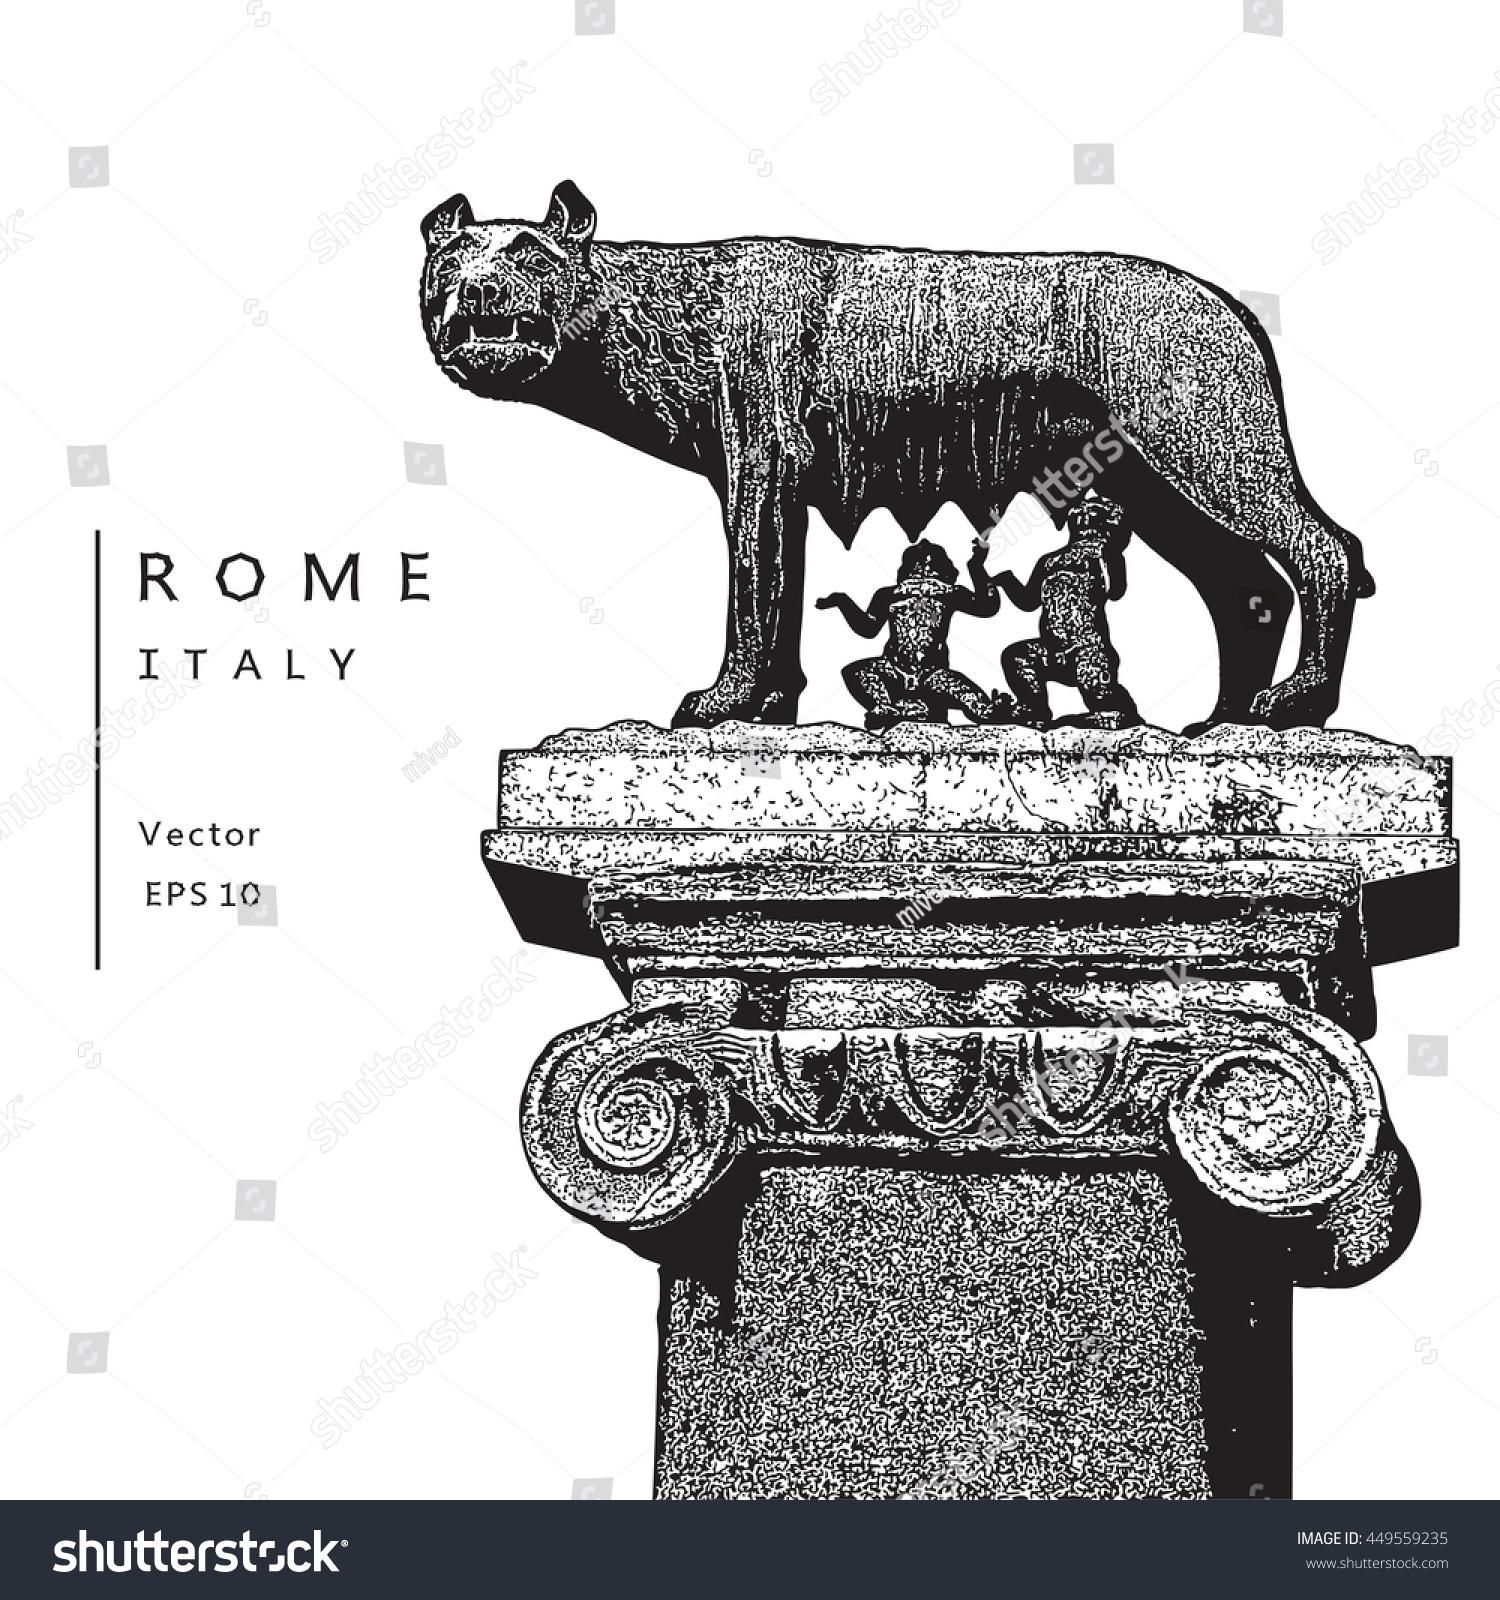 Capitoline wolf romulus remus symbol rome stock vector 449559235 capitoline wolf with romulus and remus symbol of rome italy vector illustration biocorpaavc